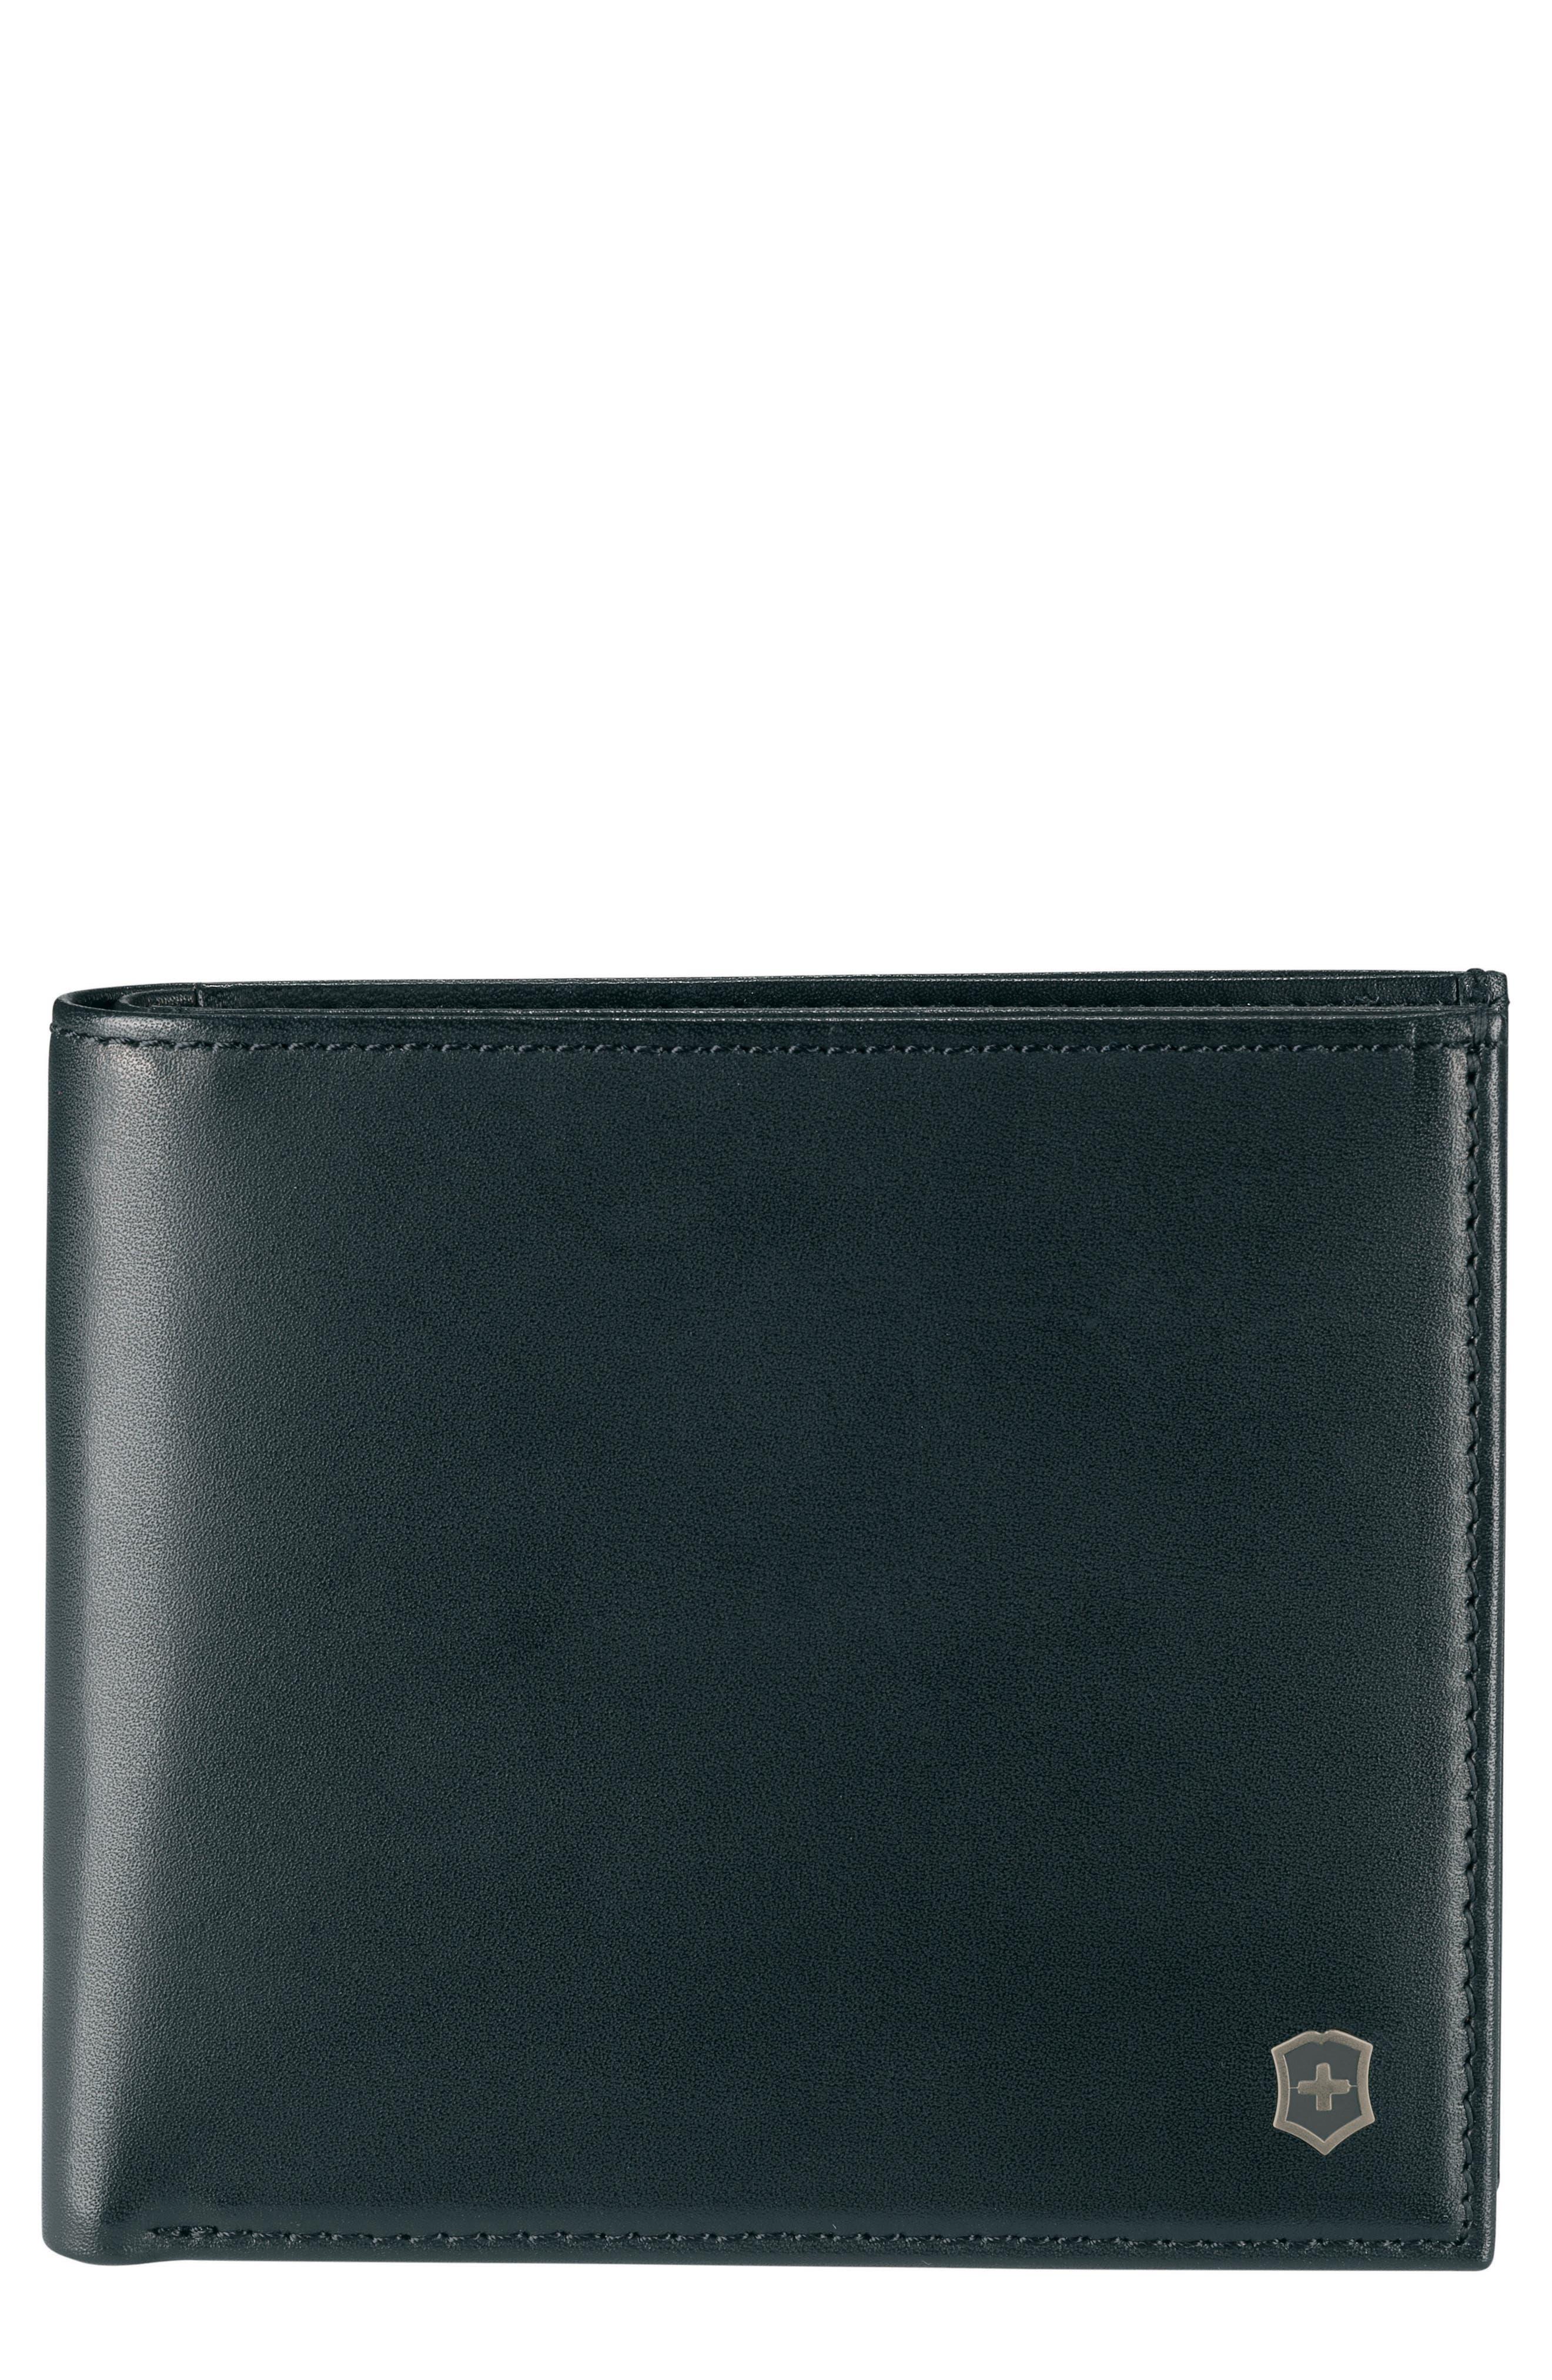 Altius Edge Pythagoras Wallet,                         Main,                         color, BLACK